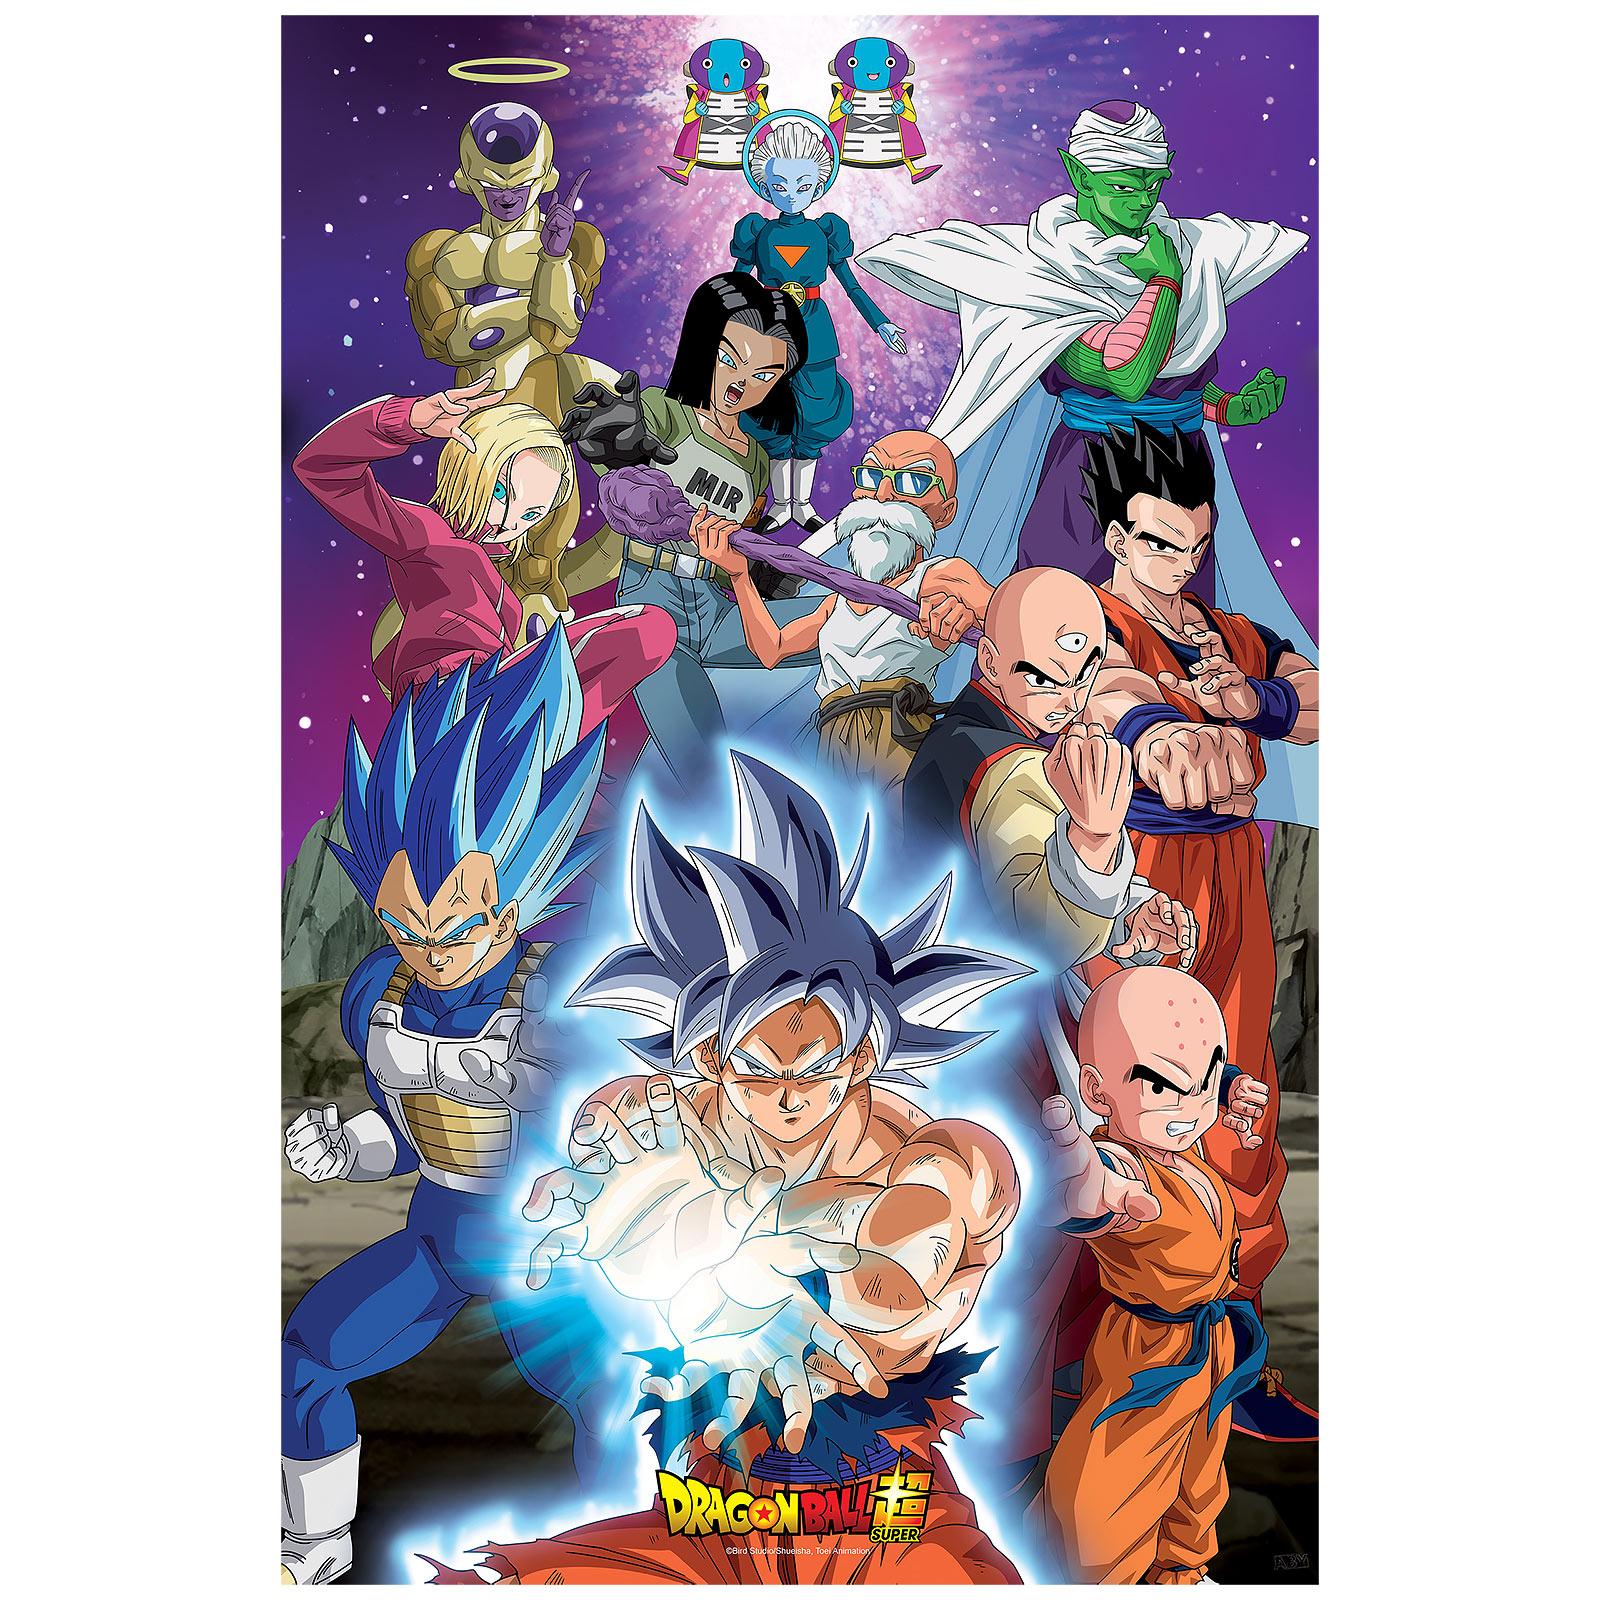 Dragon Ball Super - Universe 7 Maxi Poster